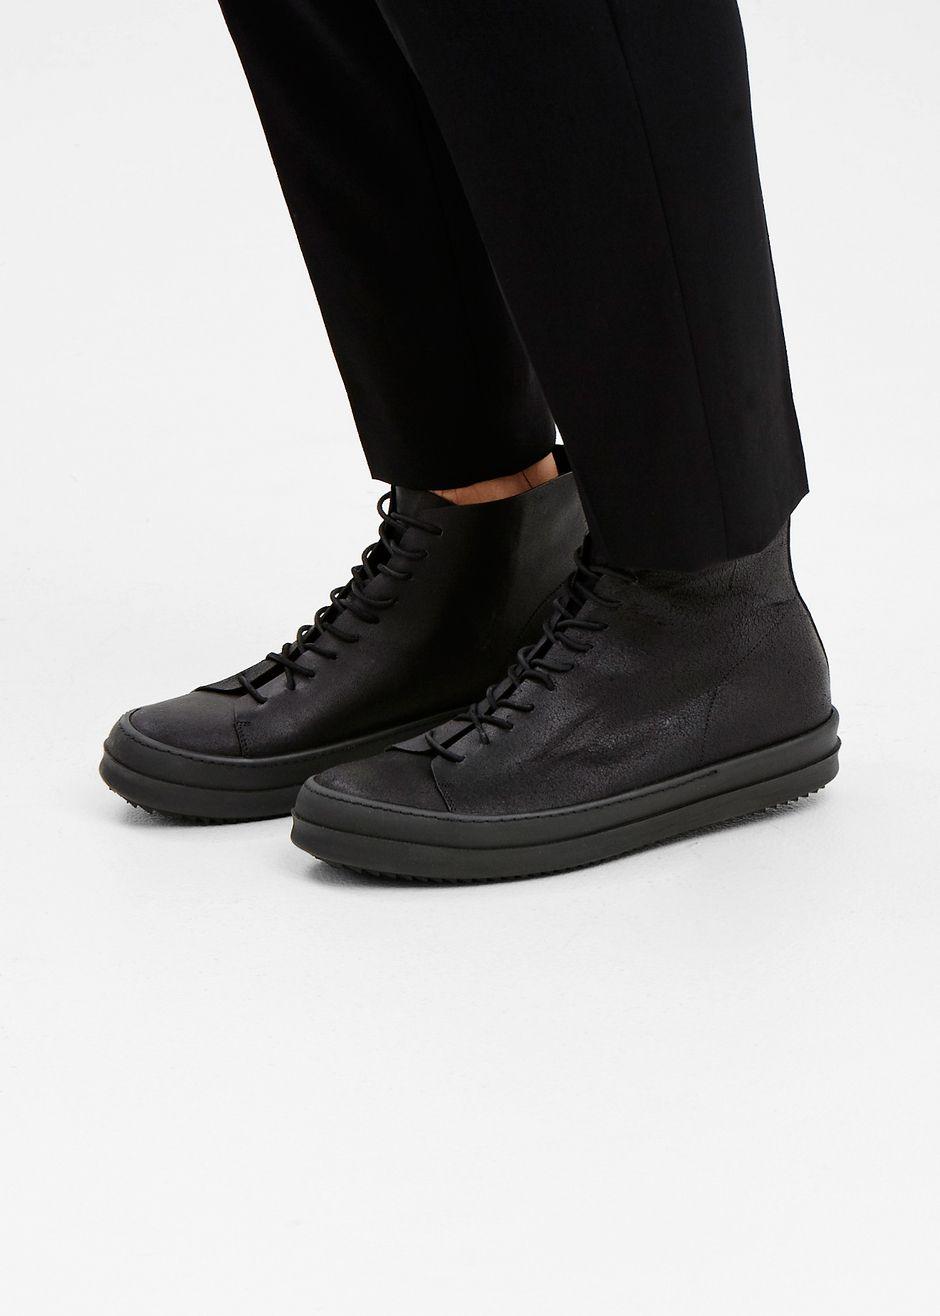 Rick Owens Black Chukka Creeper Boots prXNw7xzup